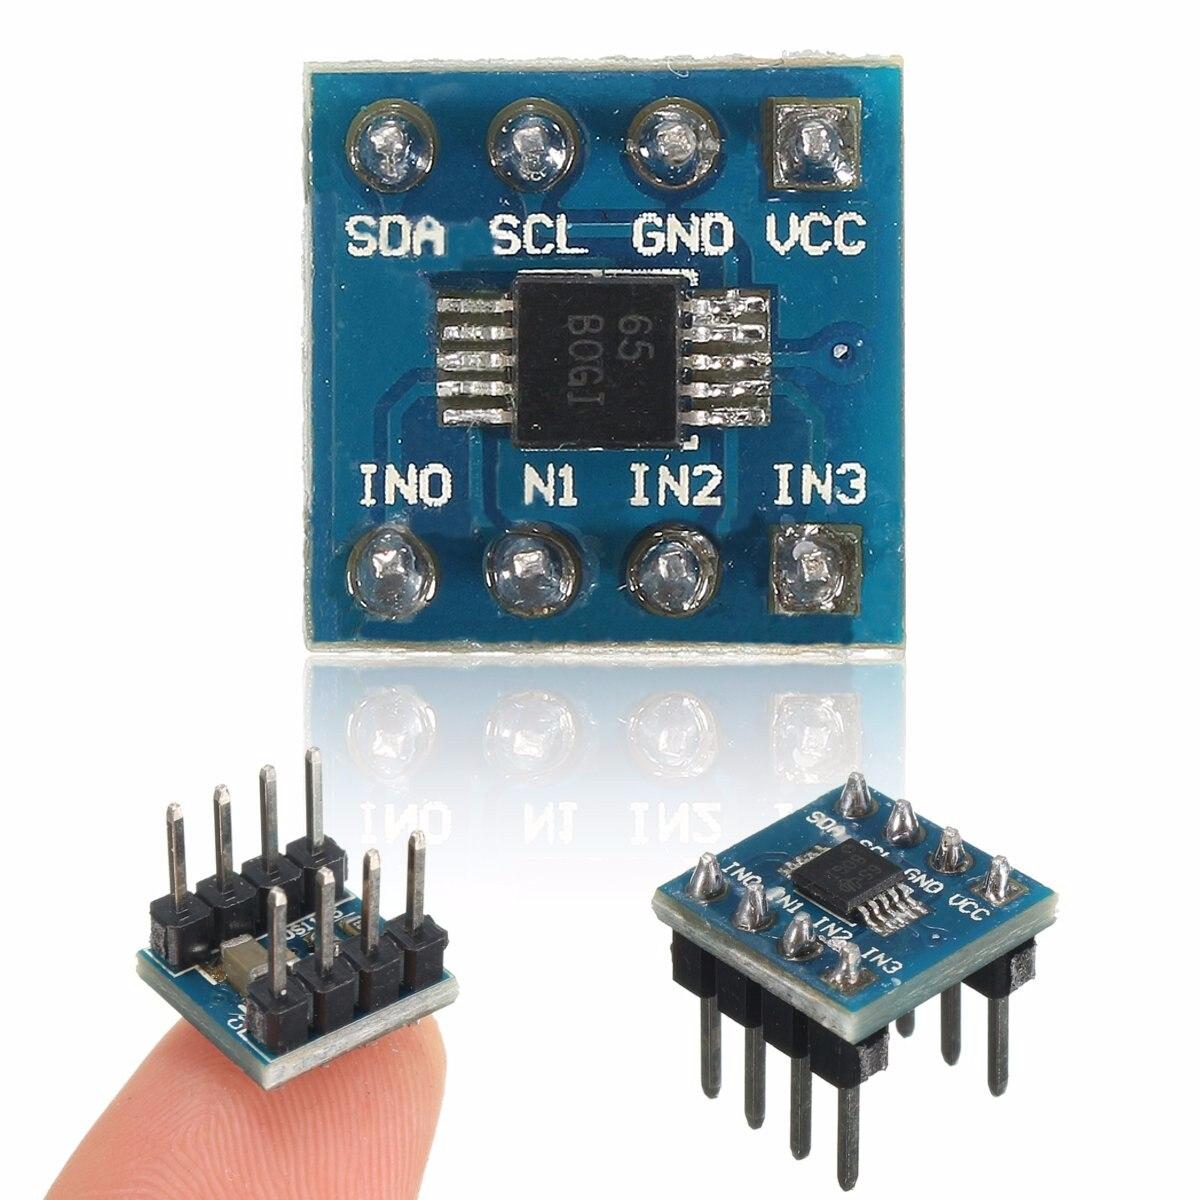 LEORY Mini ADS1115 Module 4 Channel 16 Bit I2C ADC Pro Gain Amplifier